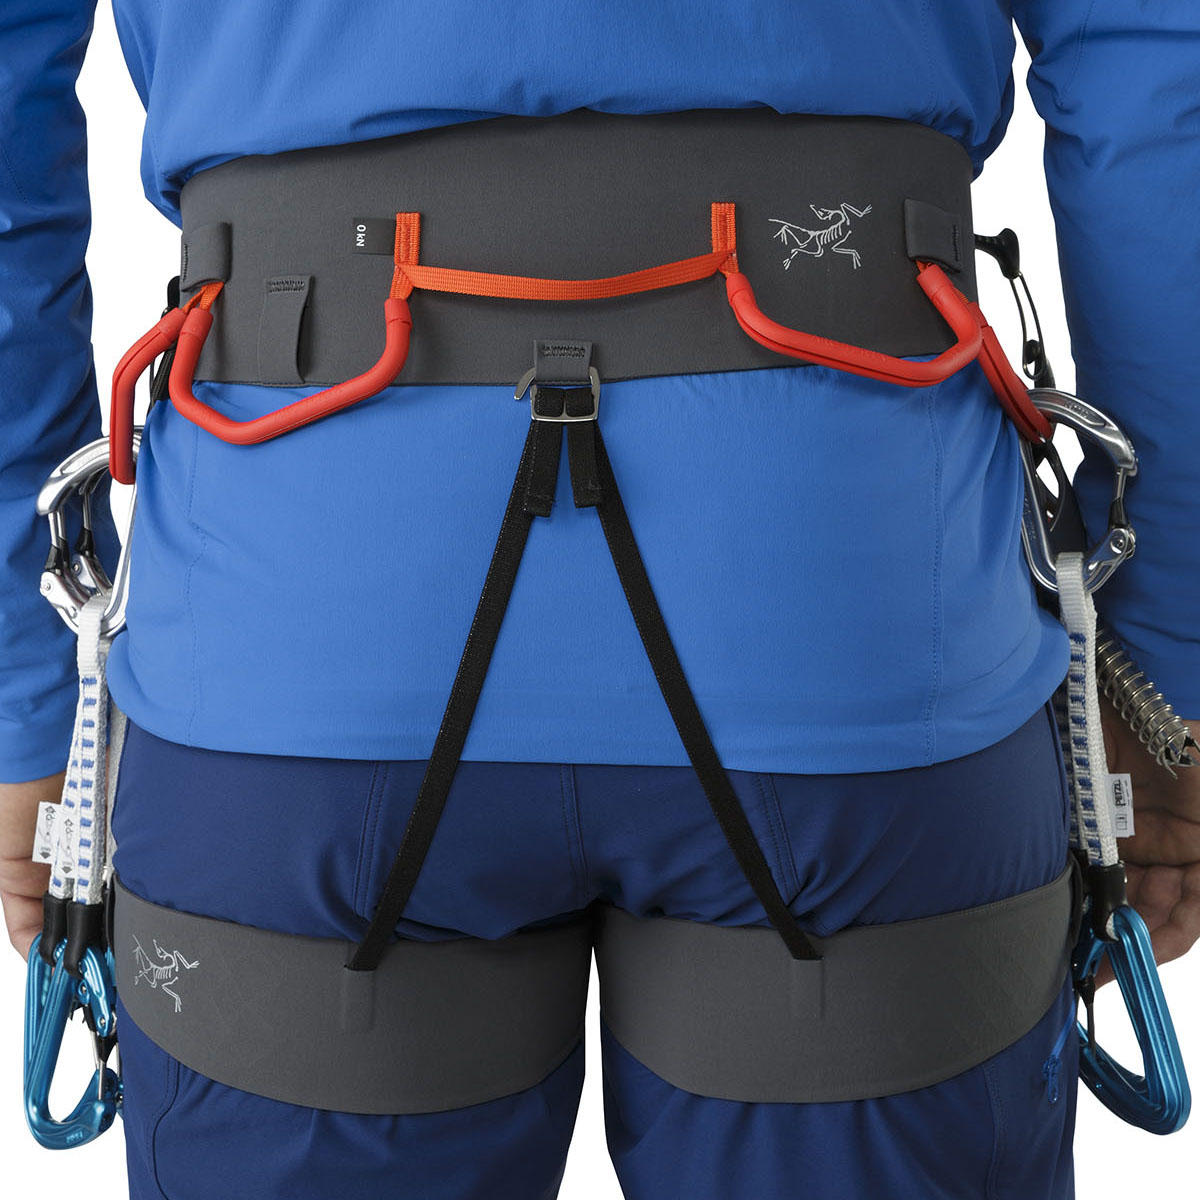 802b73a5626 Arc'teryx AR-395a Harness Men's | Harnesses | EpicTV Shop